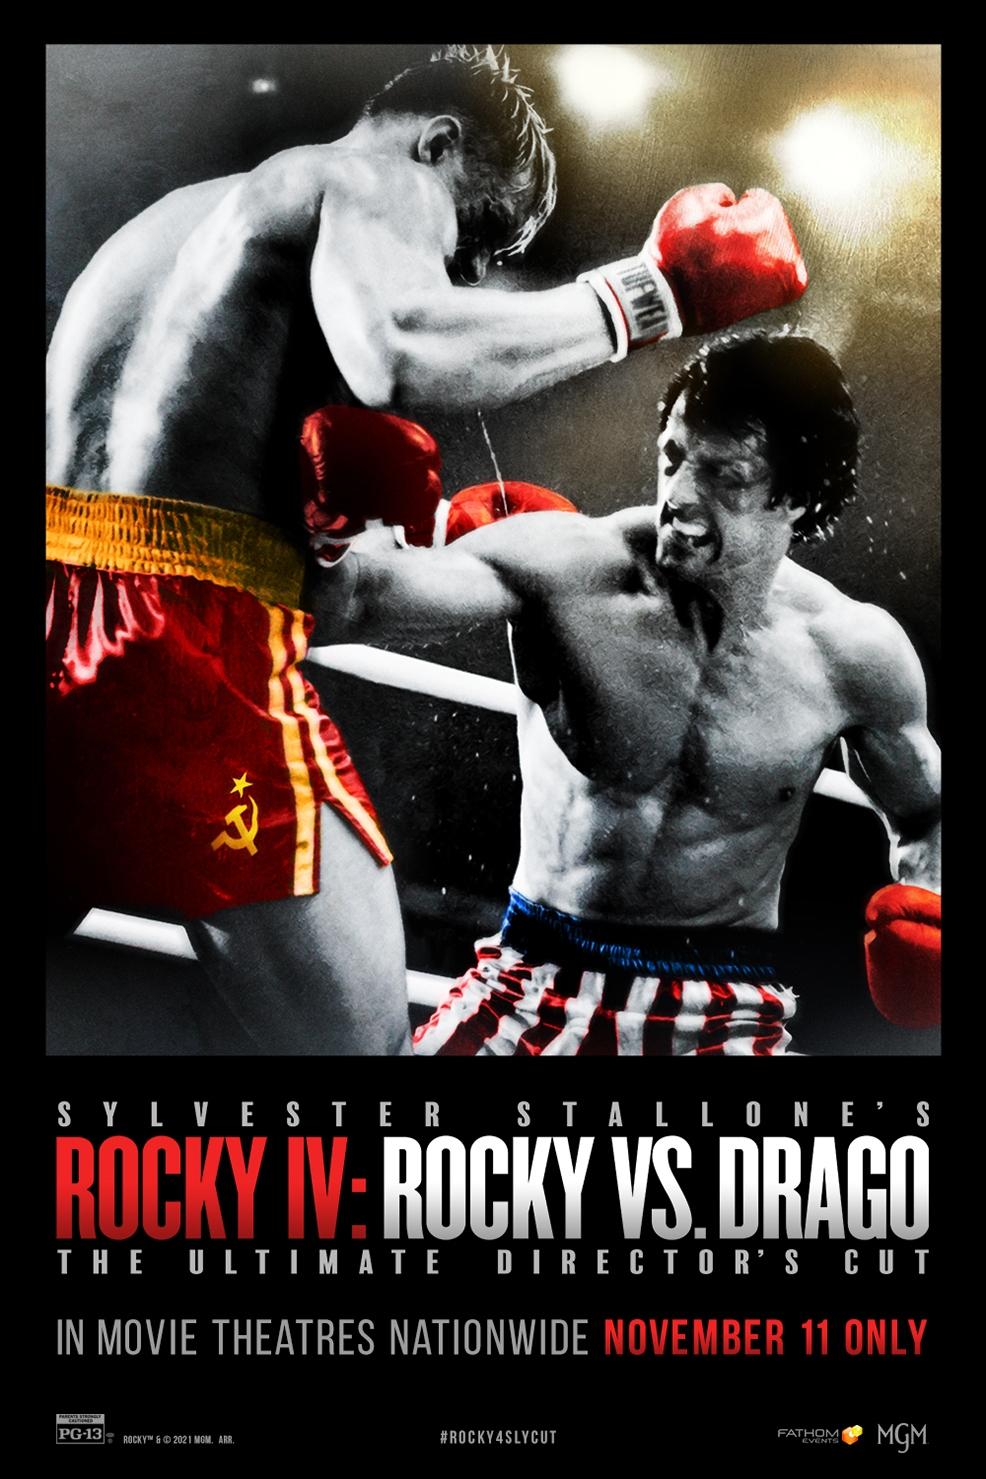 Poster of Rocky IV: Rocky Vs. Drago